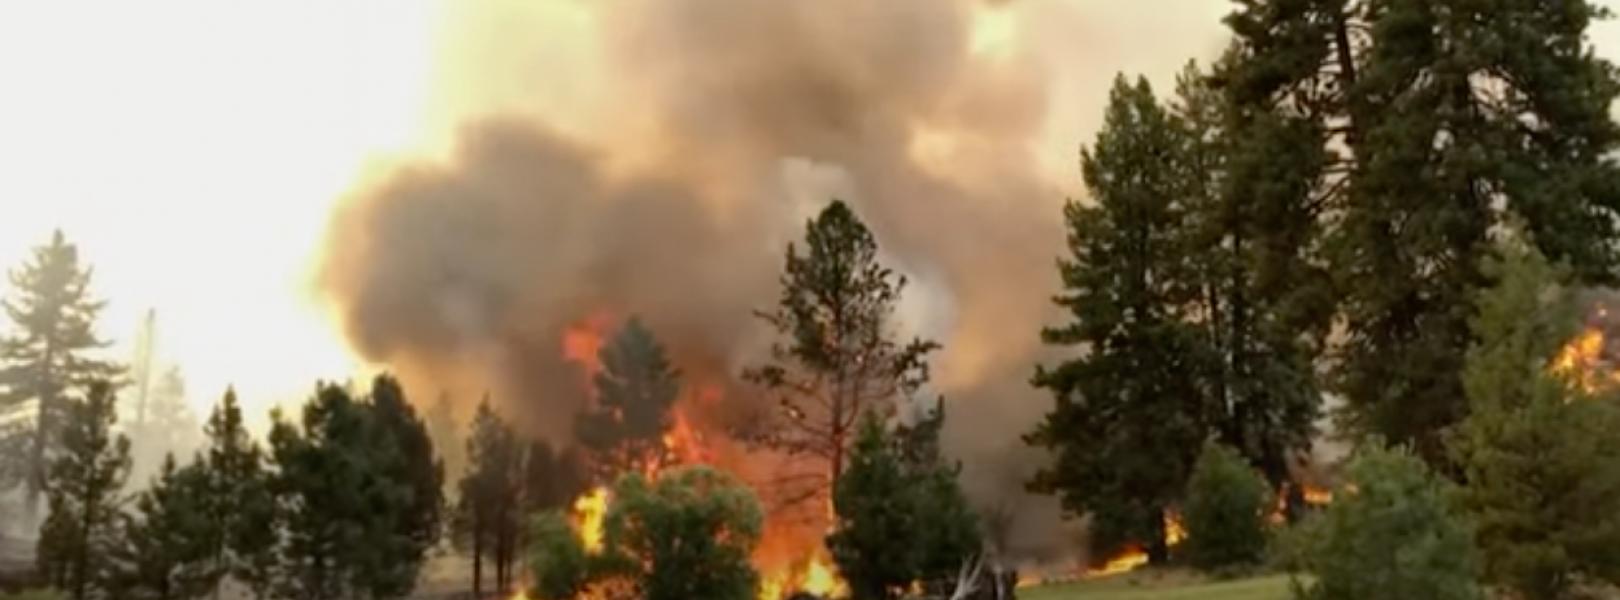 AP wildfire CA coverage